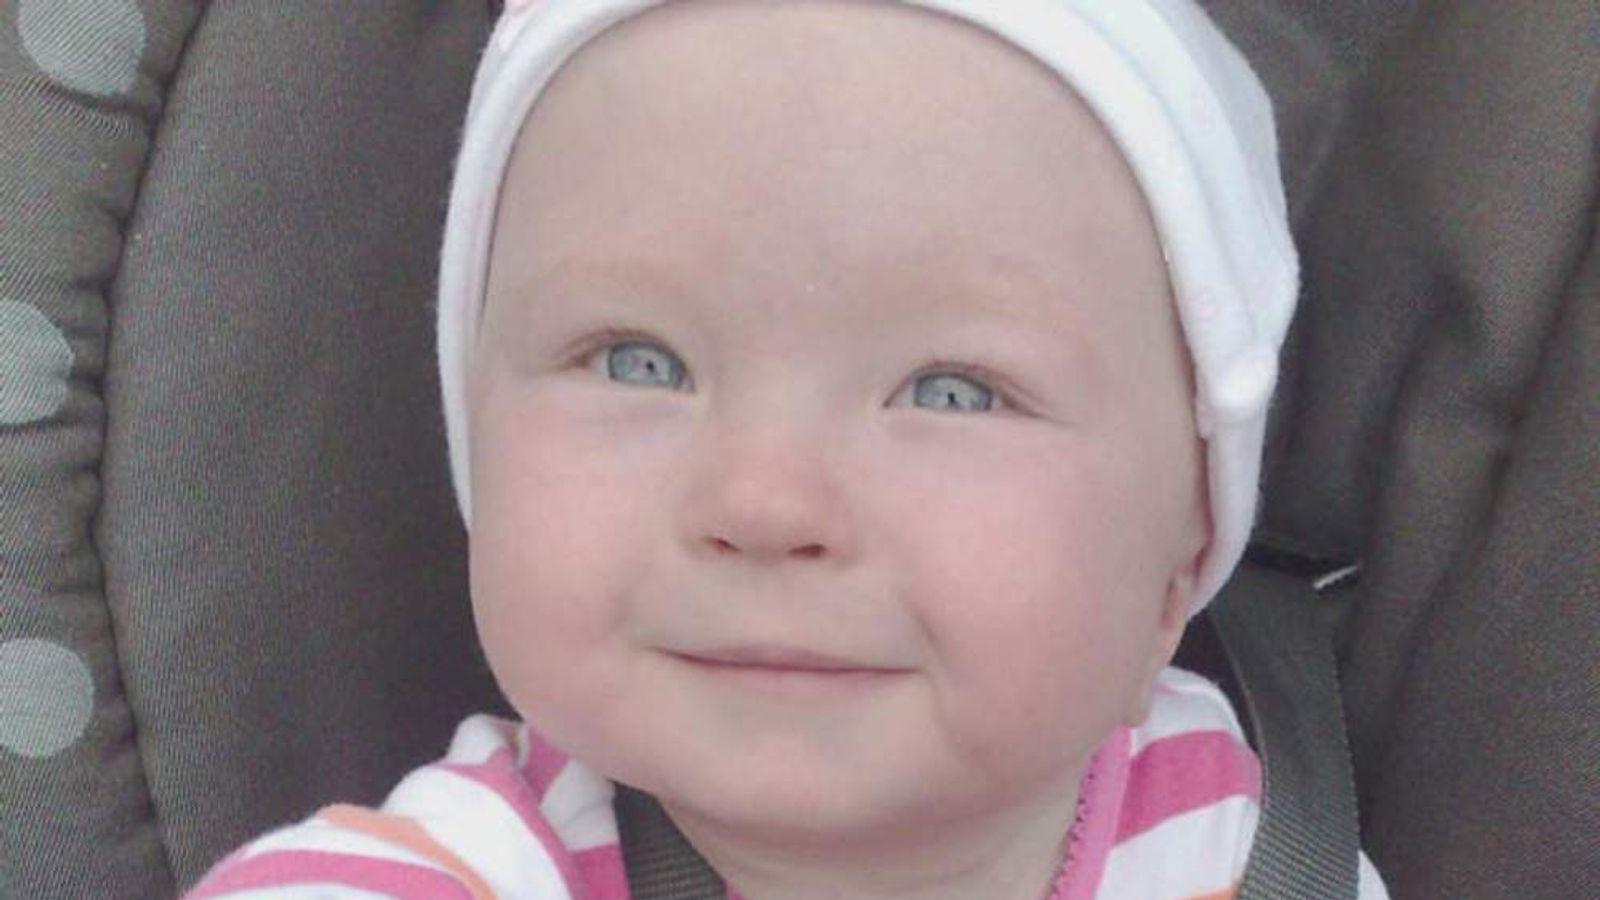 Hayley Fullerton, who died at Birmingham Children's Hospital in Nov 2009